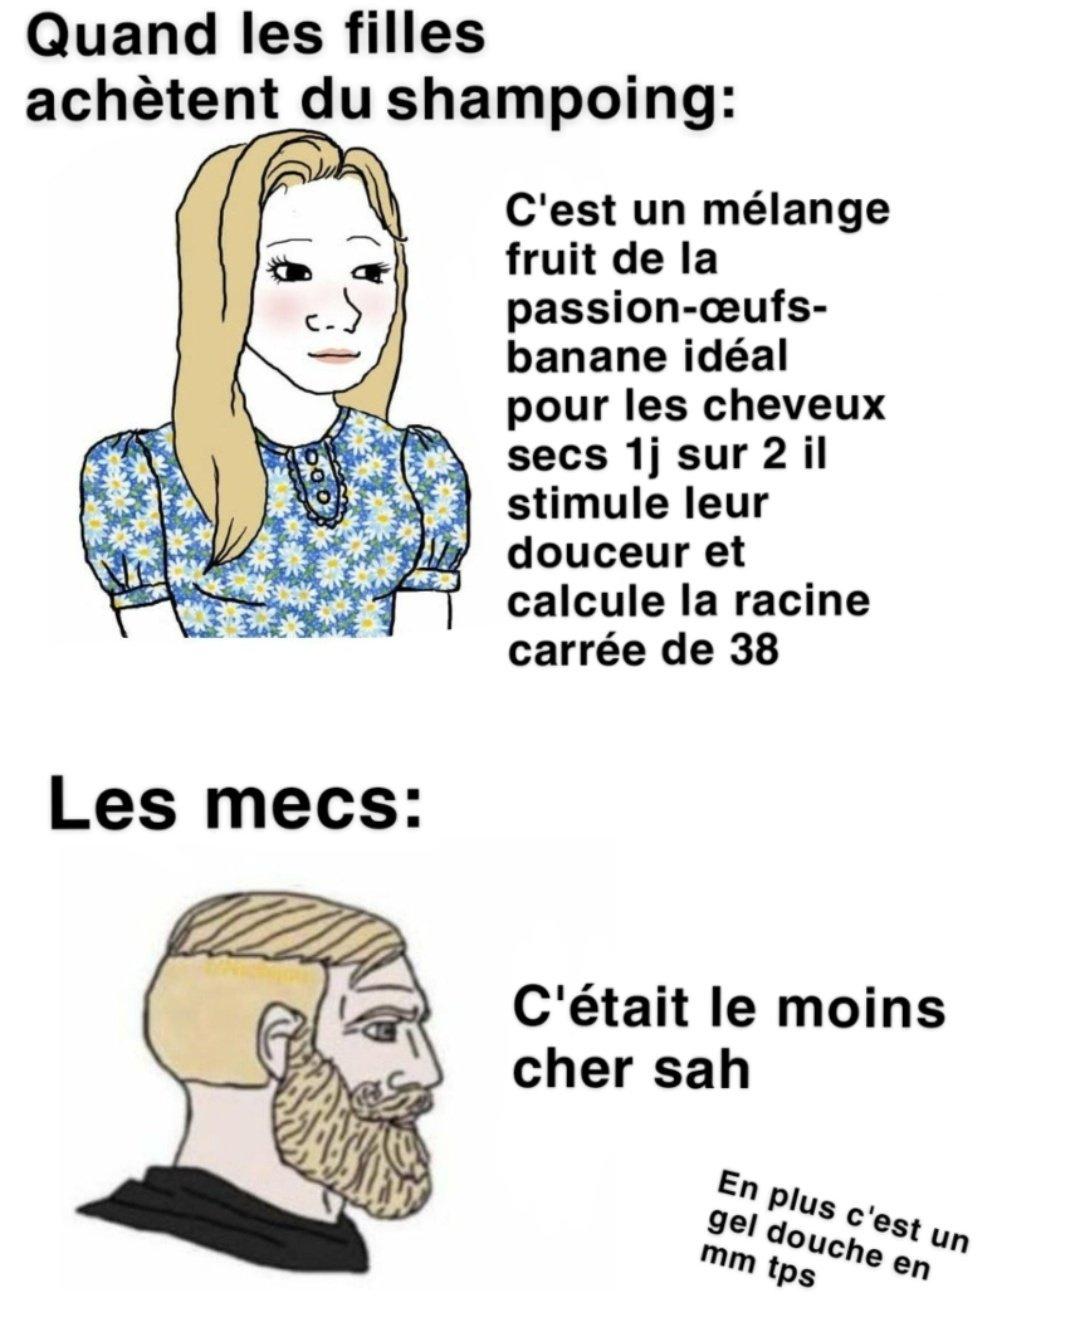 Le shampoing - meme